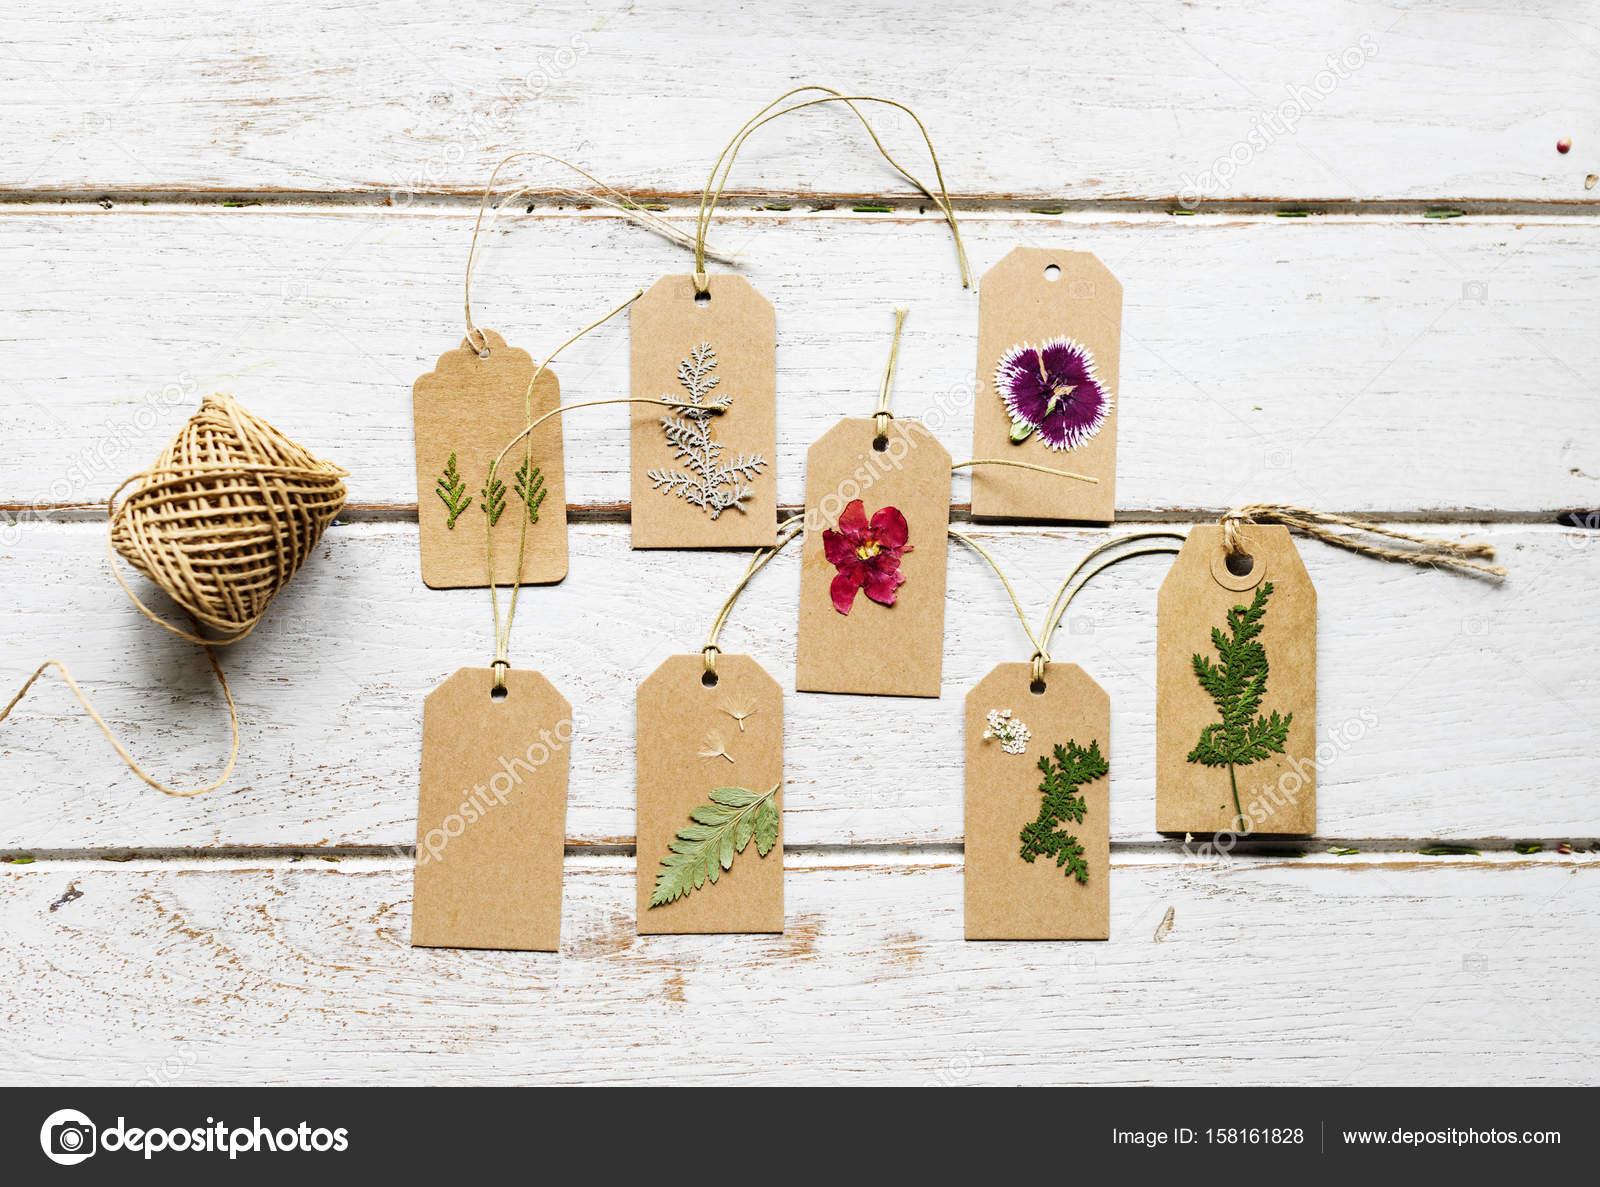 Wooden Table Flowers Pressed Flower Paper Original Photoset Stock